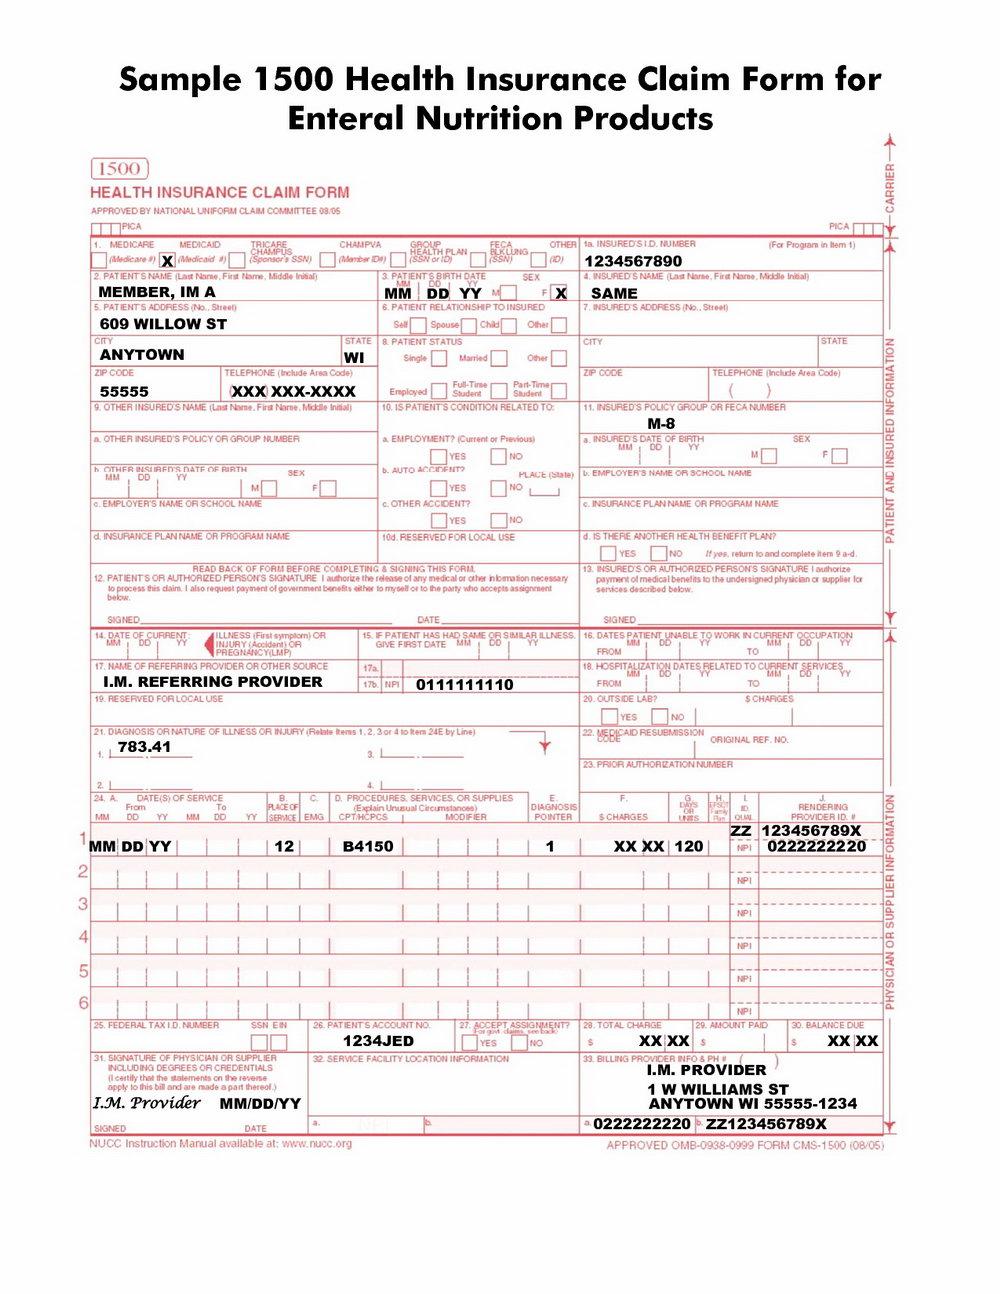 Cms 1500 Form Instructions